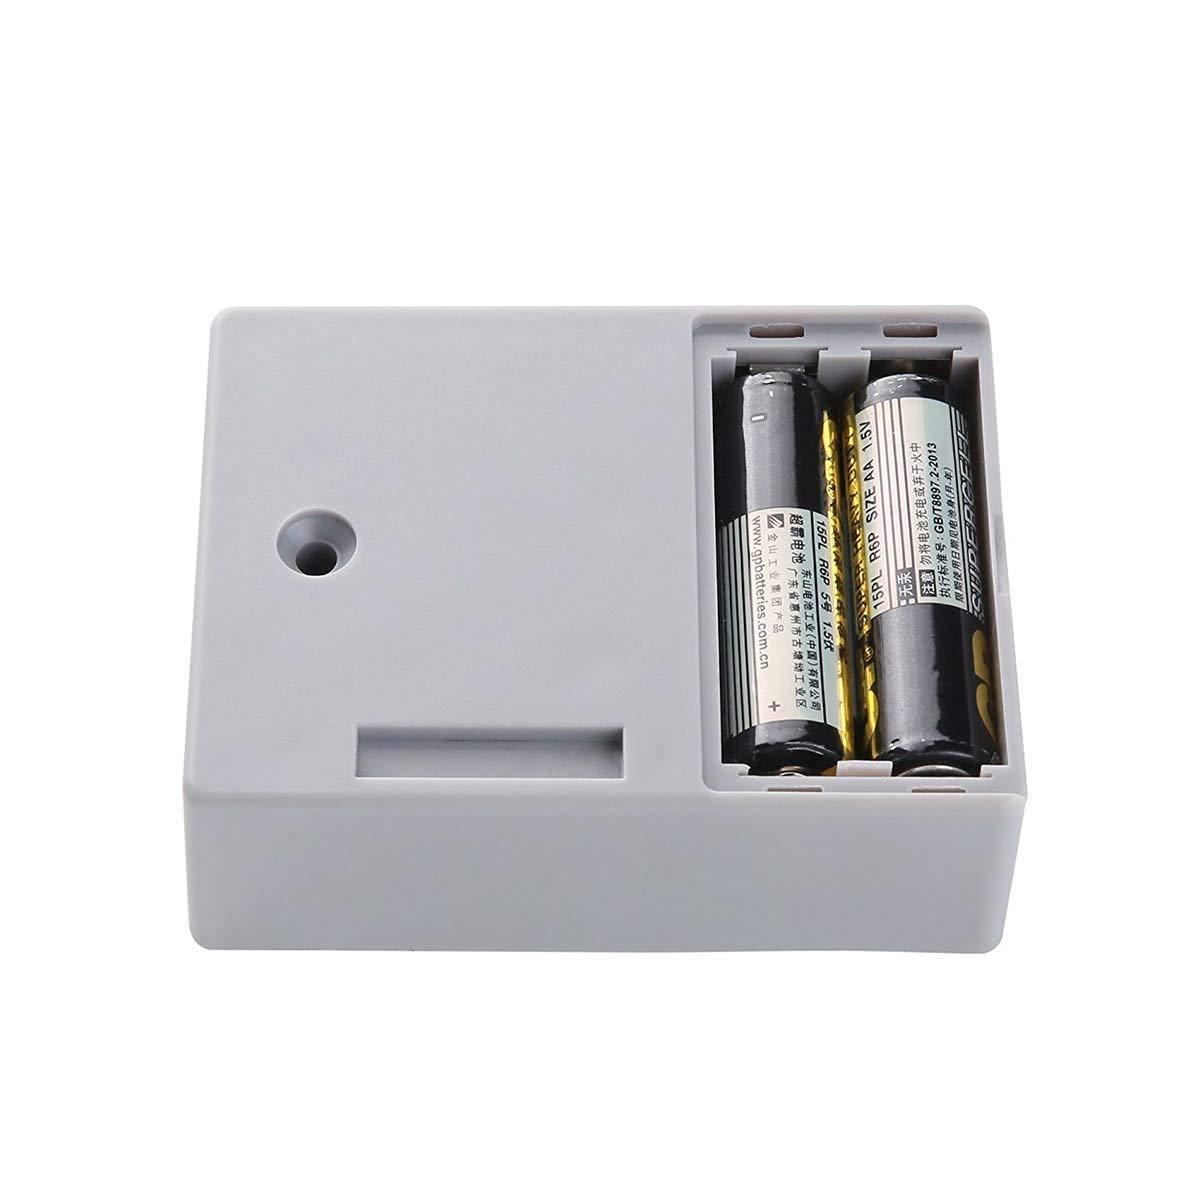 Amazon.com: Diconna RFID Electronic Cabinet Lock Hidden DIY Lock Kit Set for Drawer Locker: Office Products